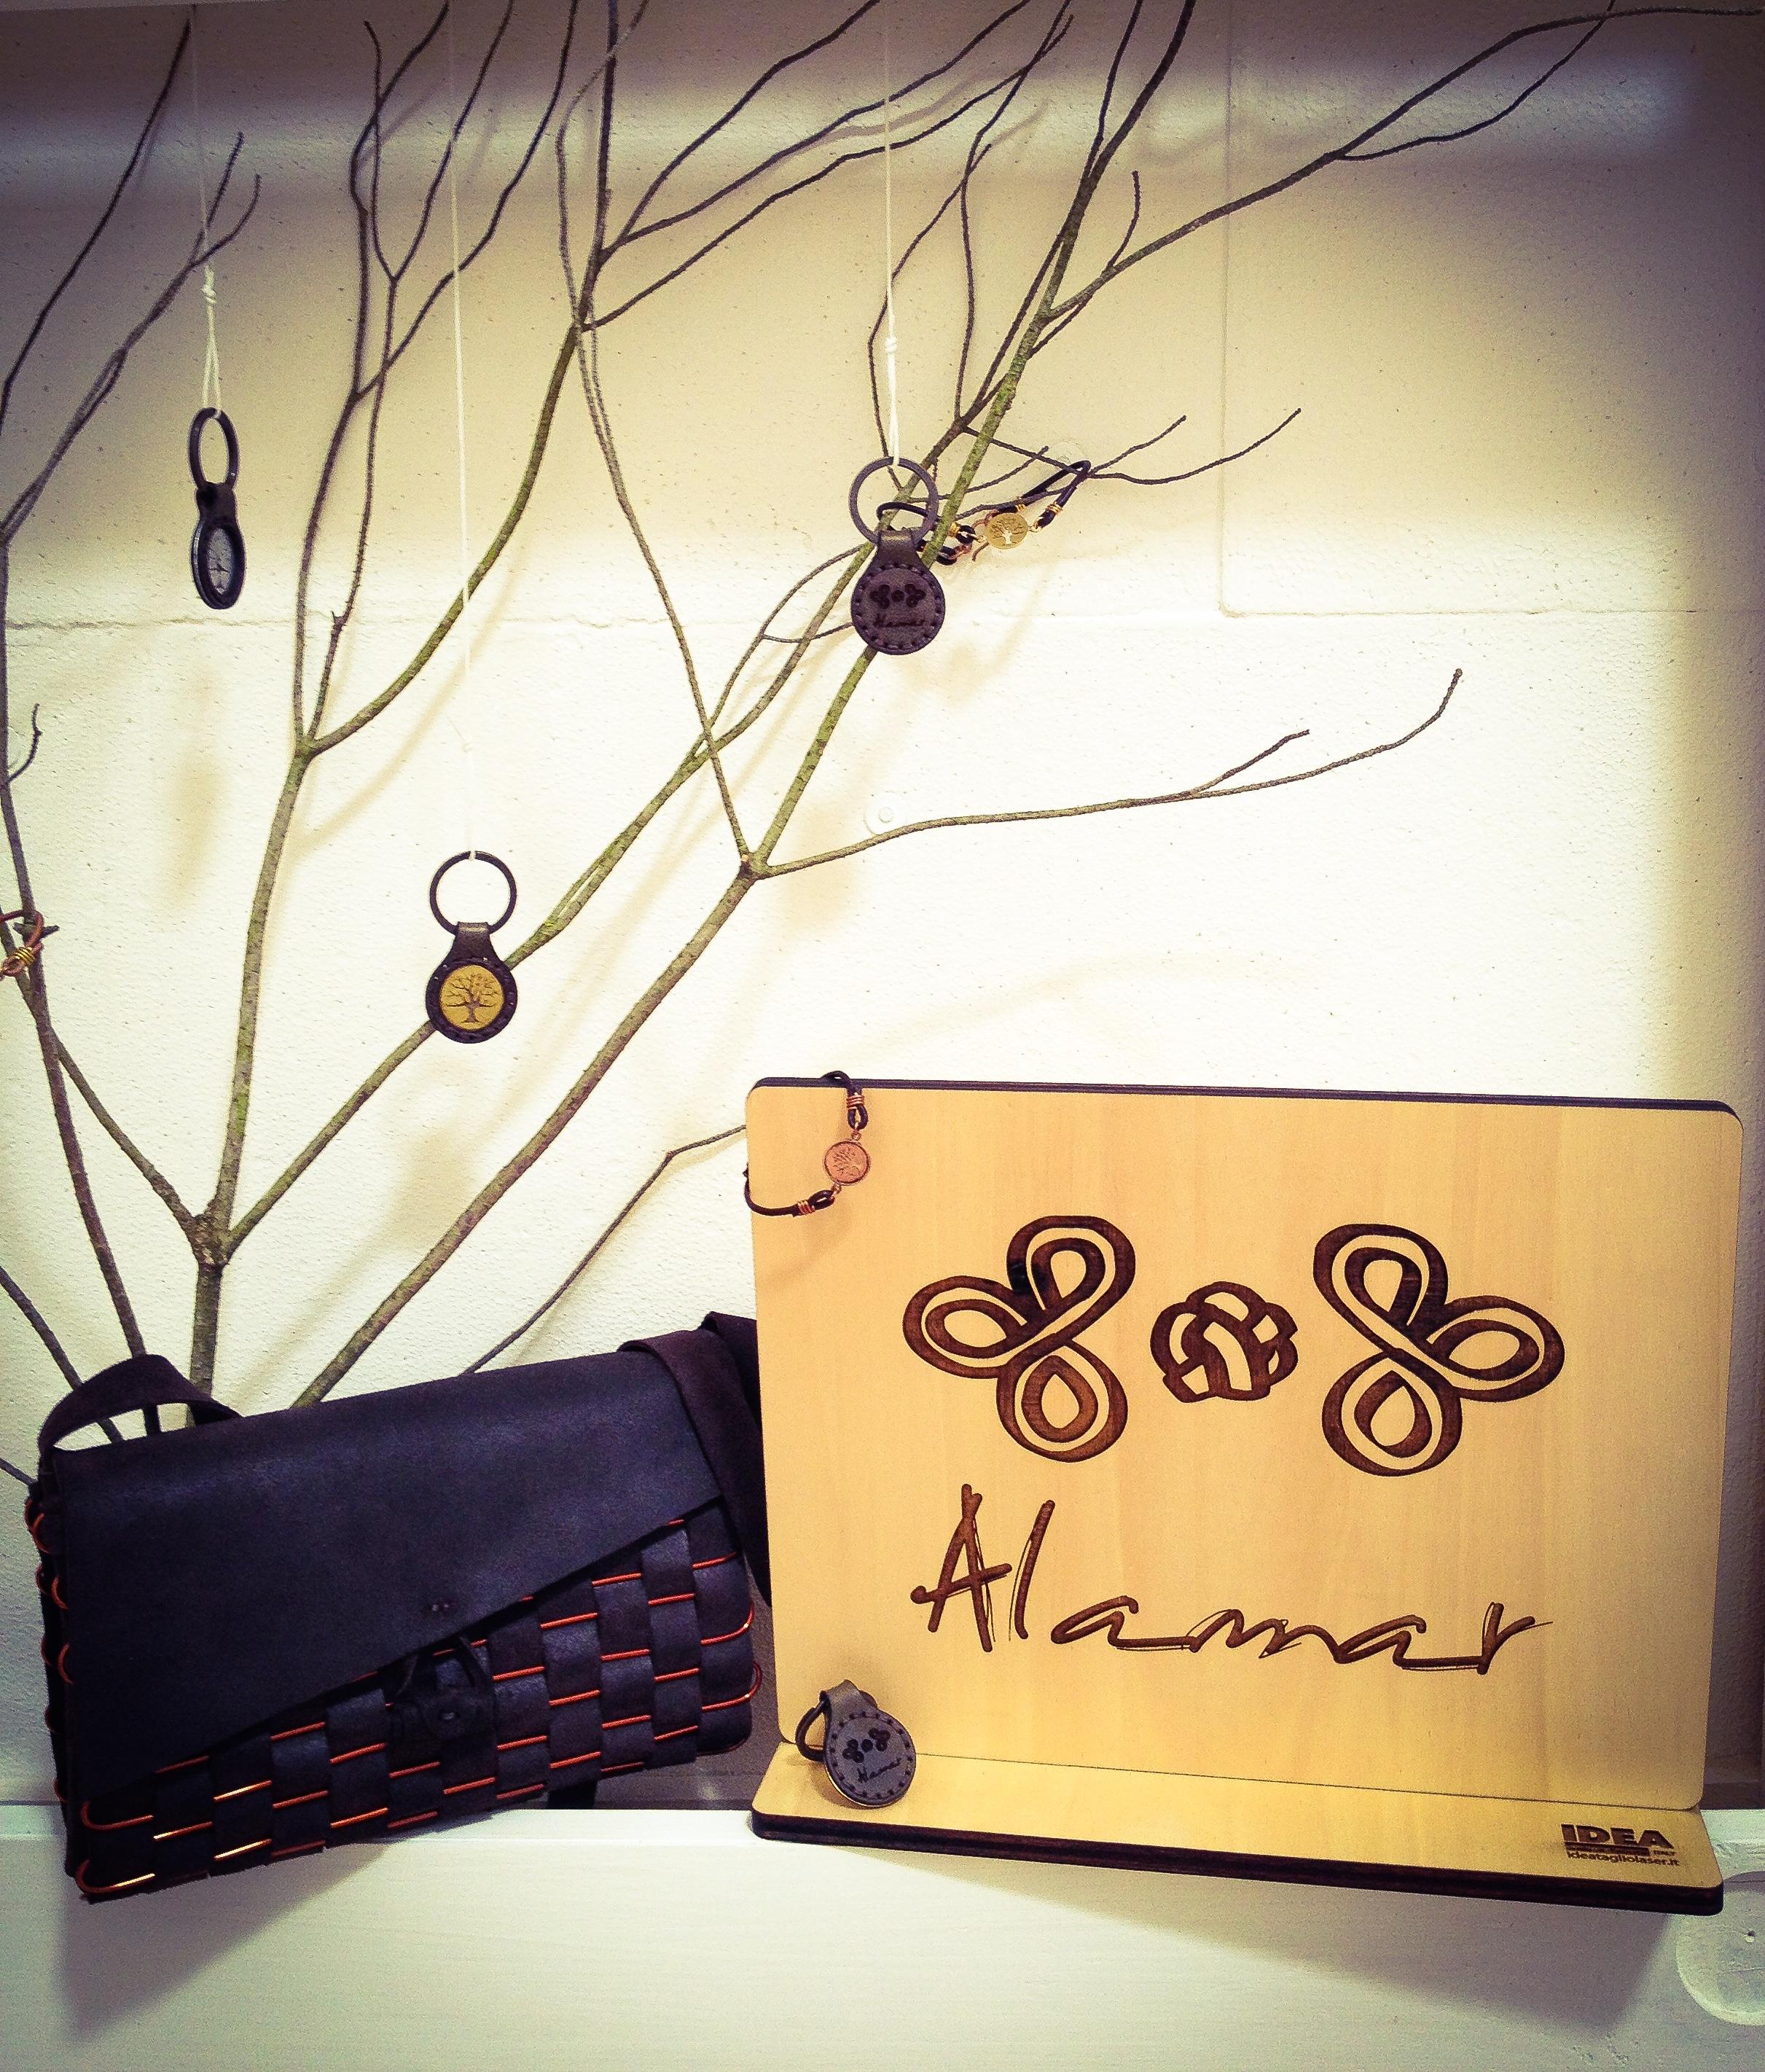 prodotti Alamar